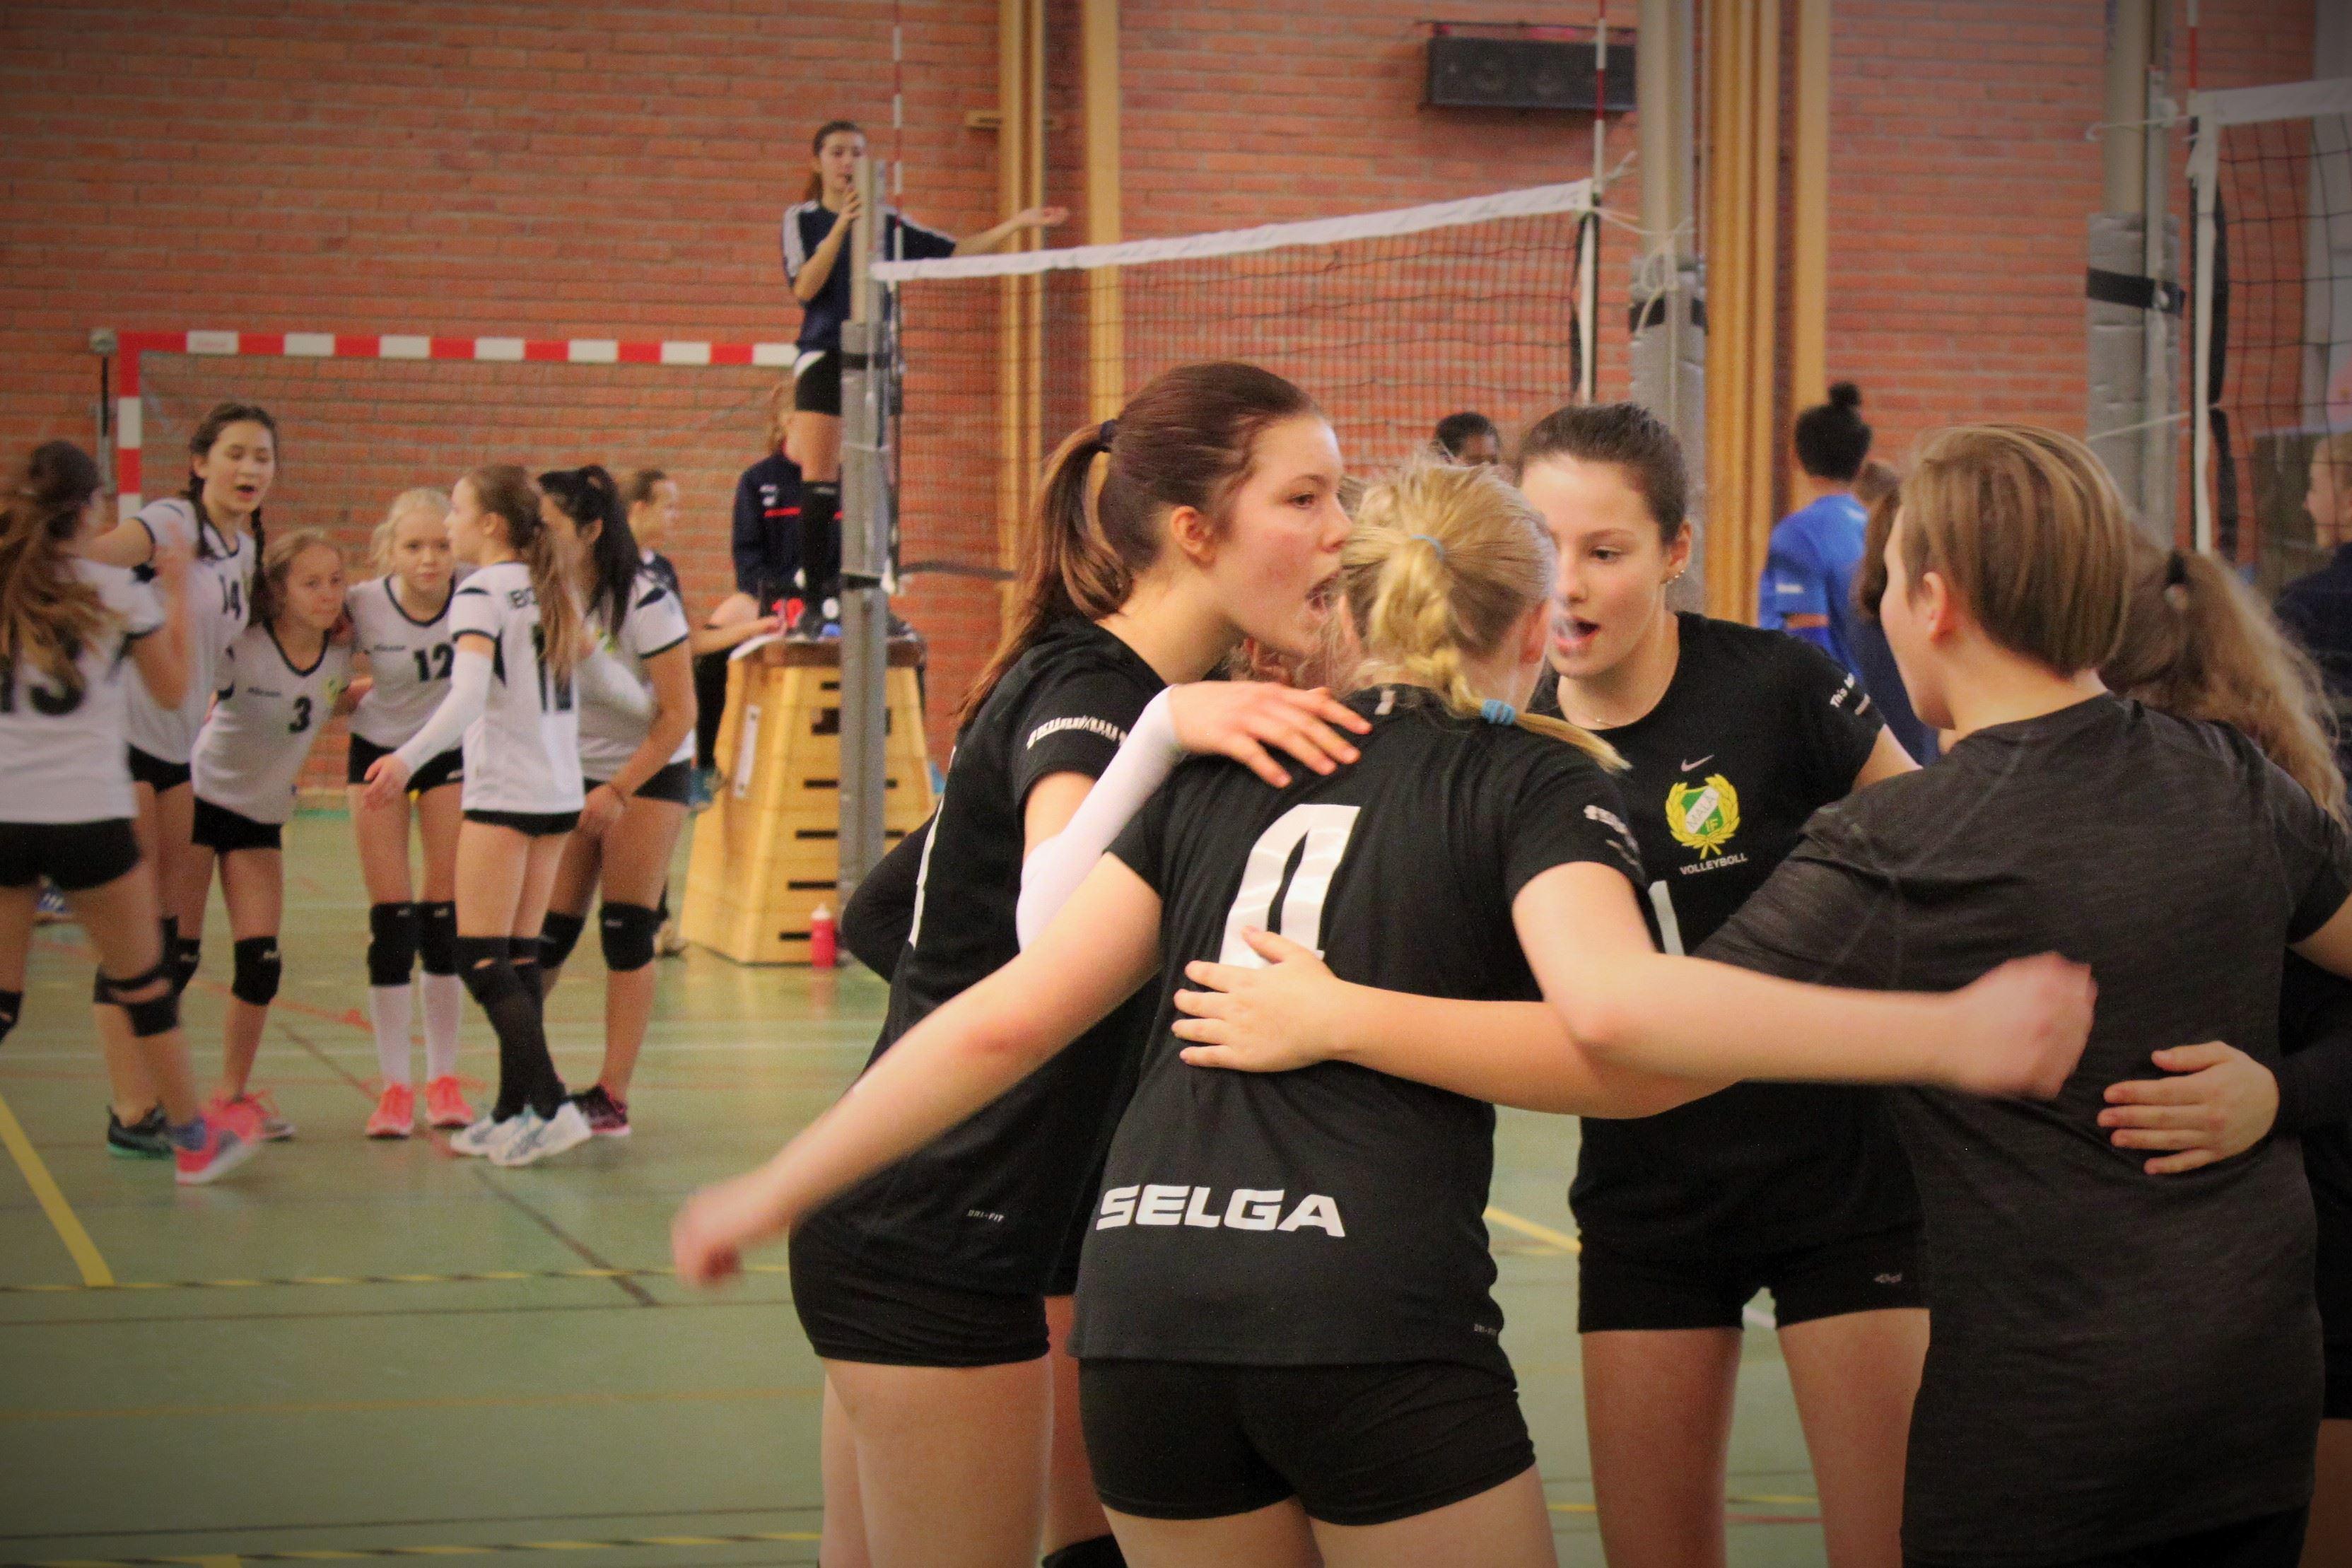 Malåcupen - volleyboll level 6